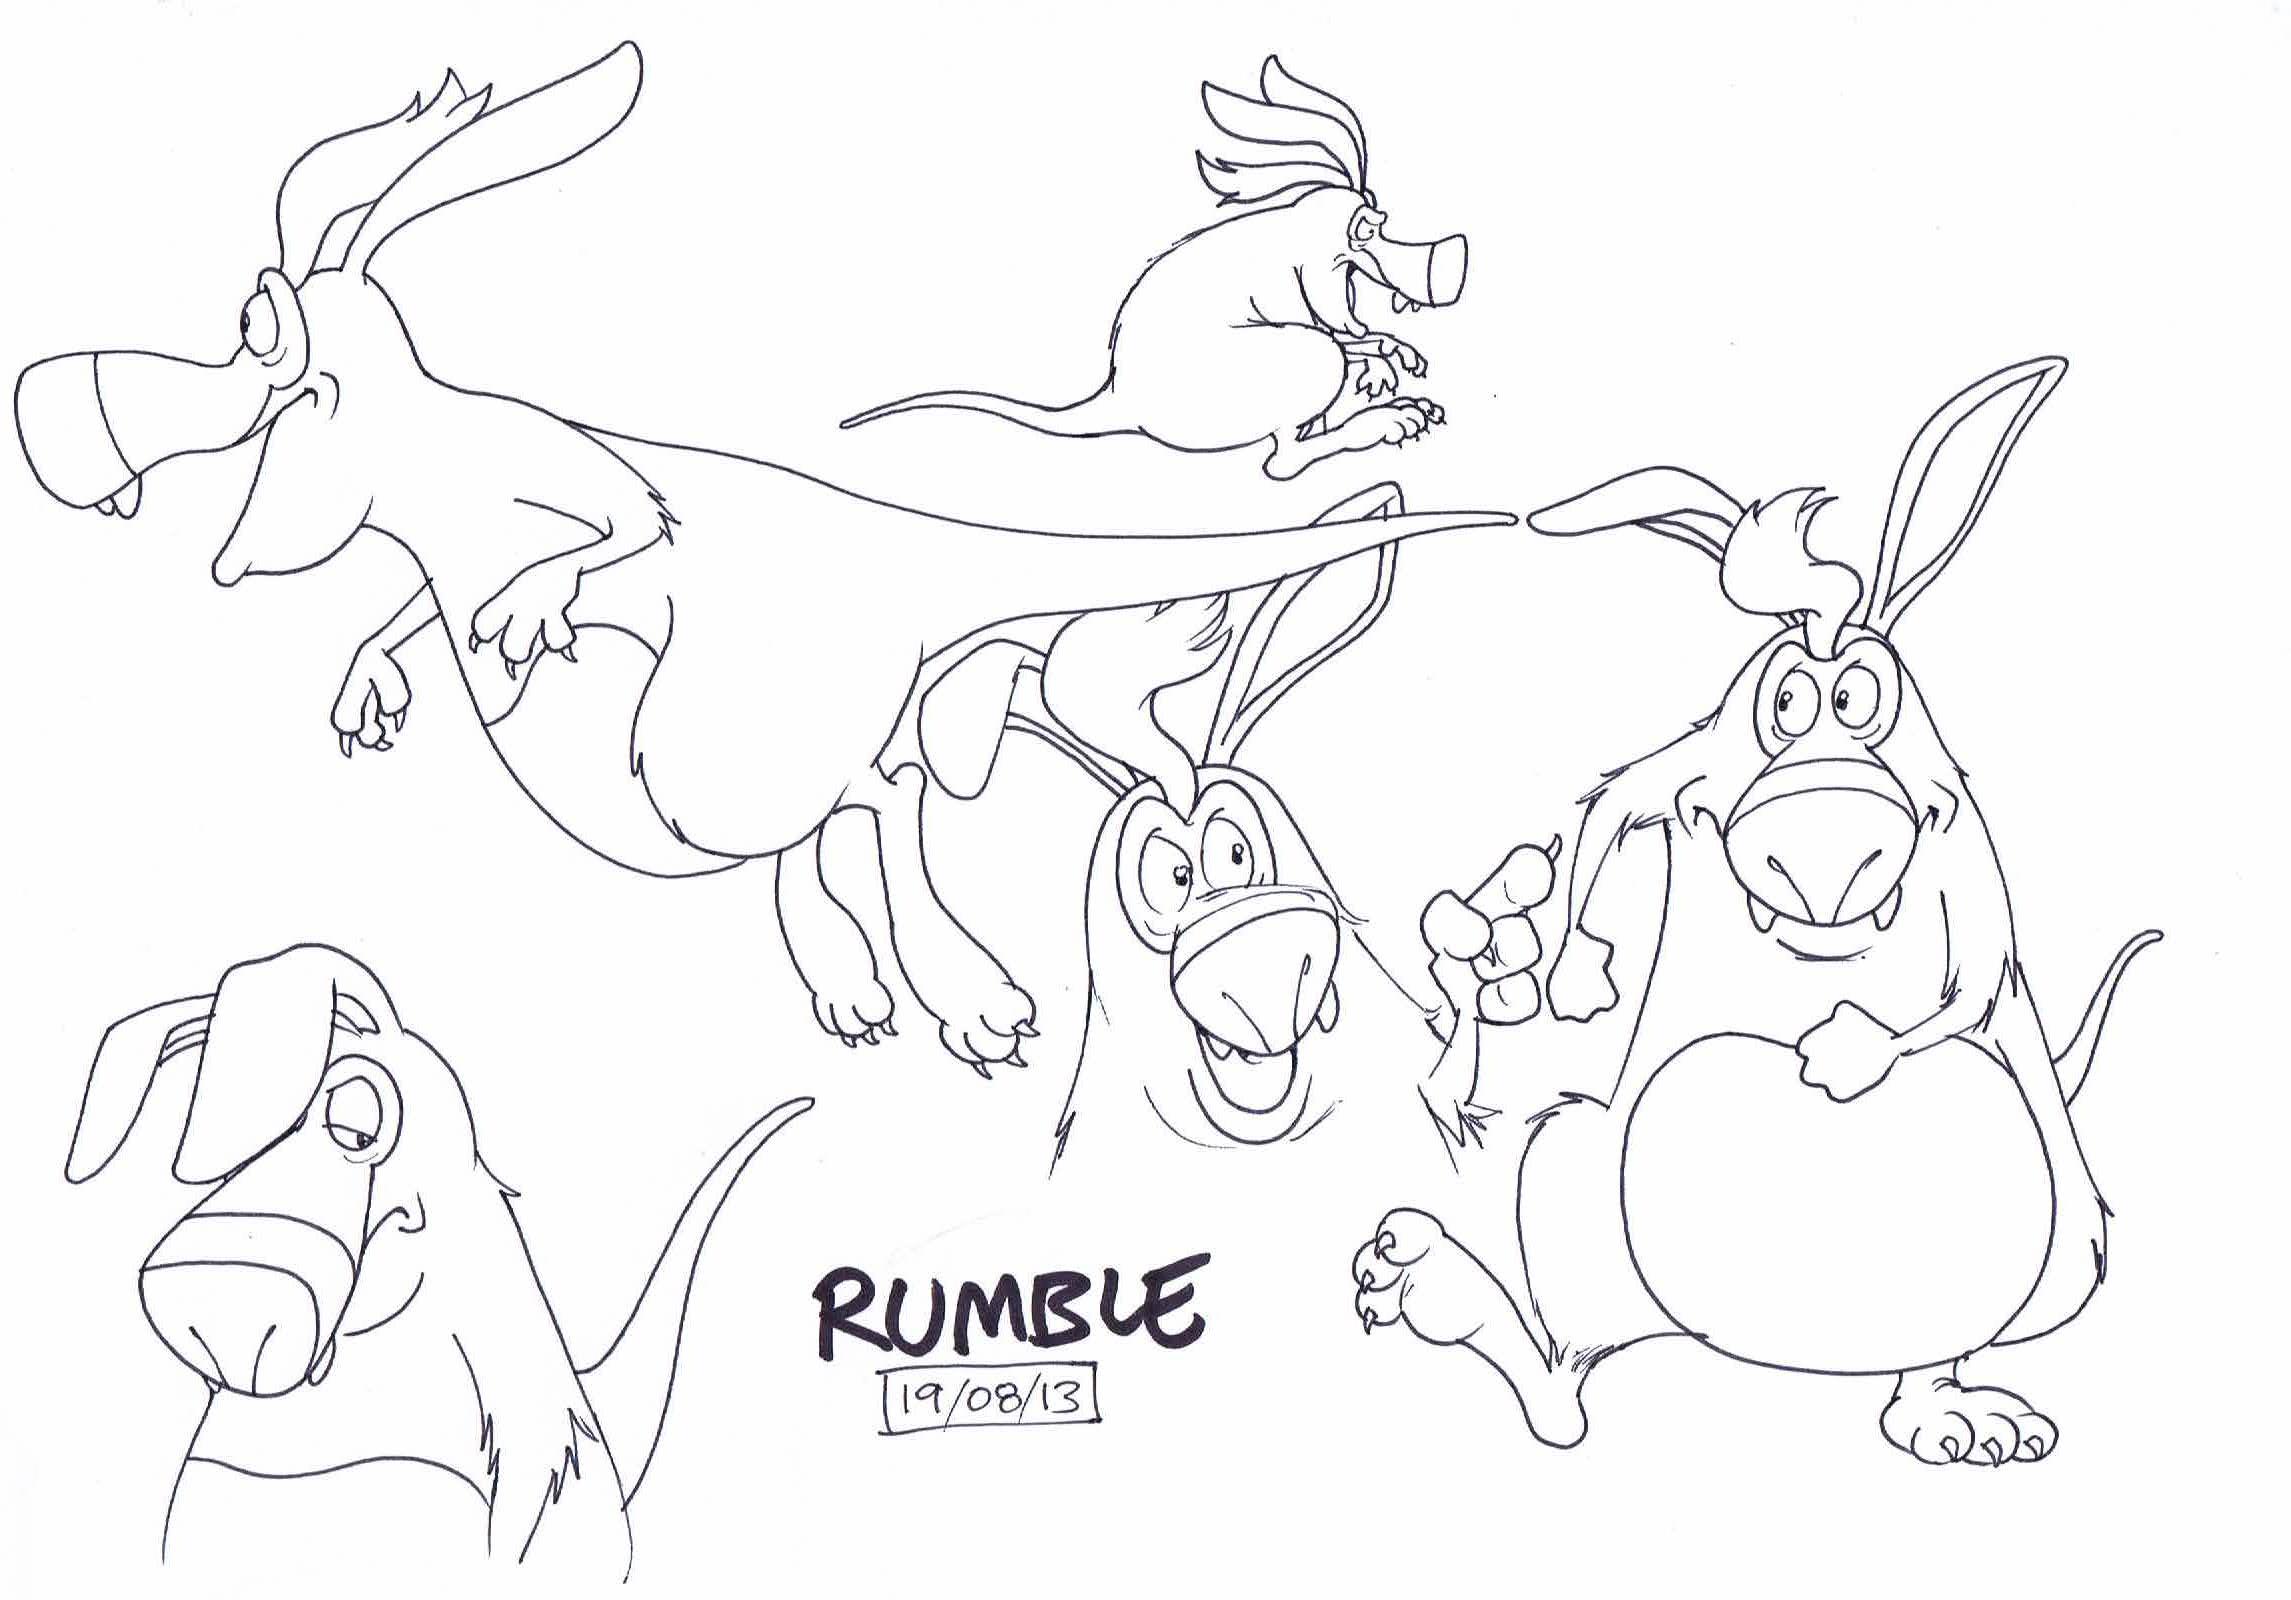 RUMBLE POSES.jpg